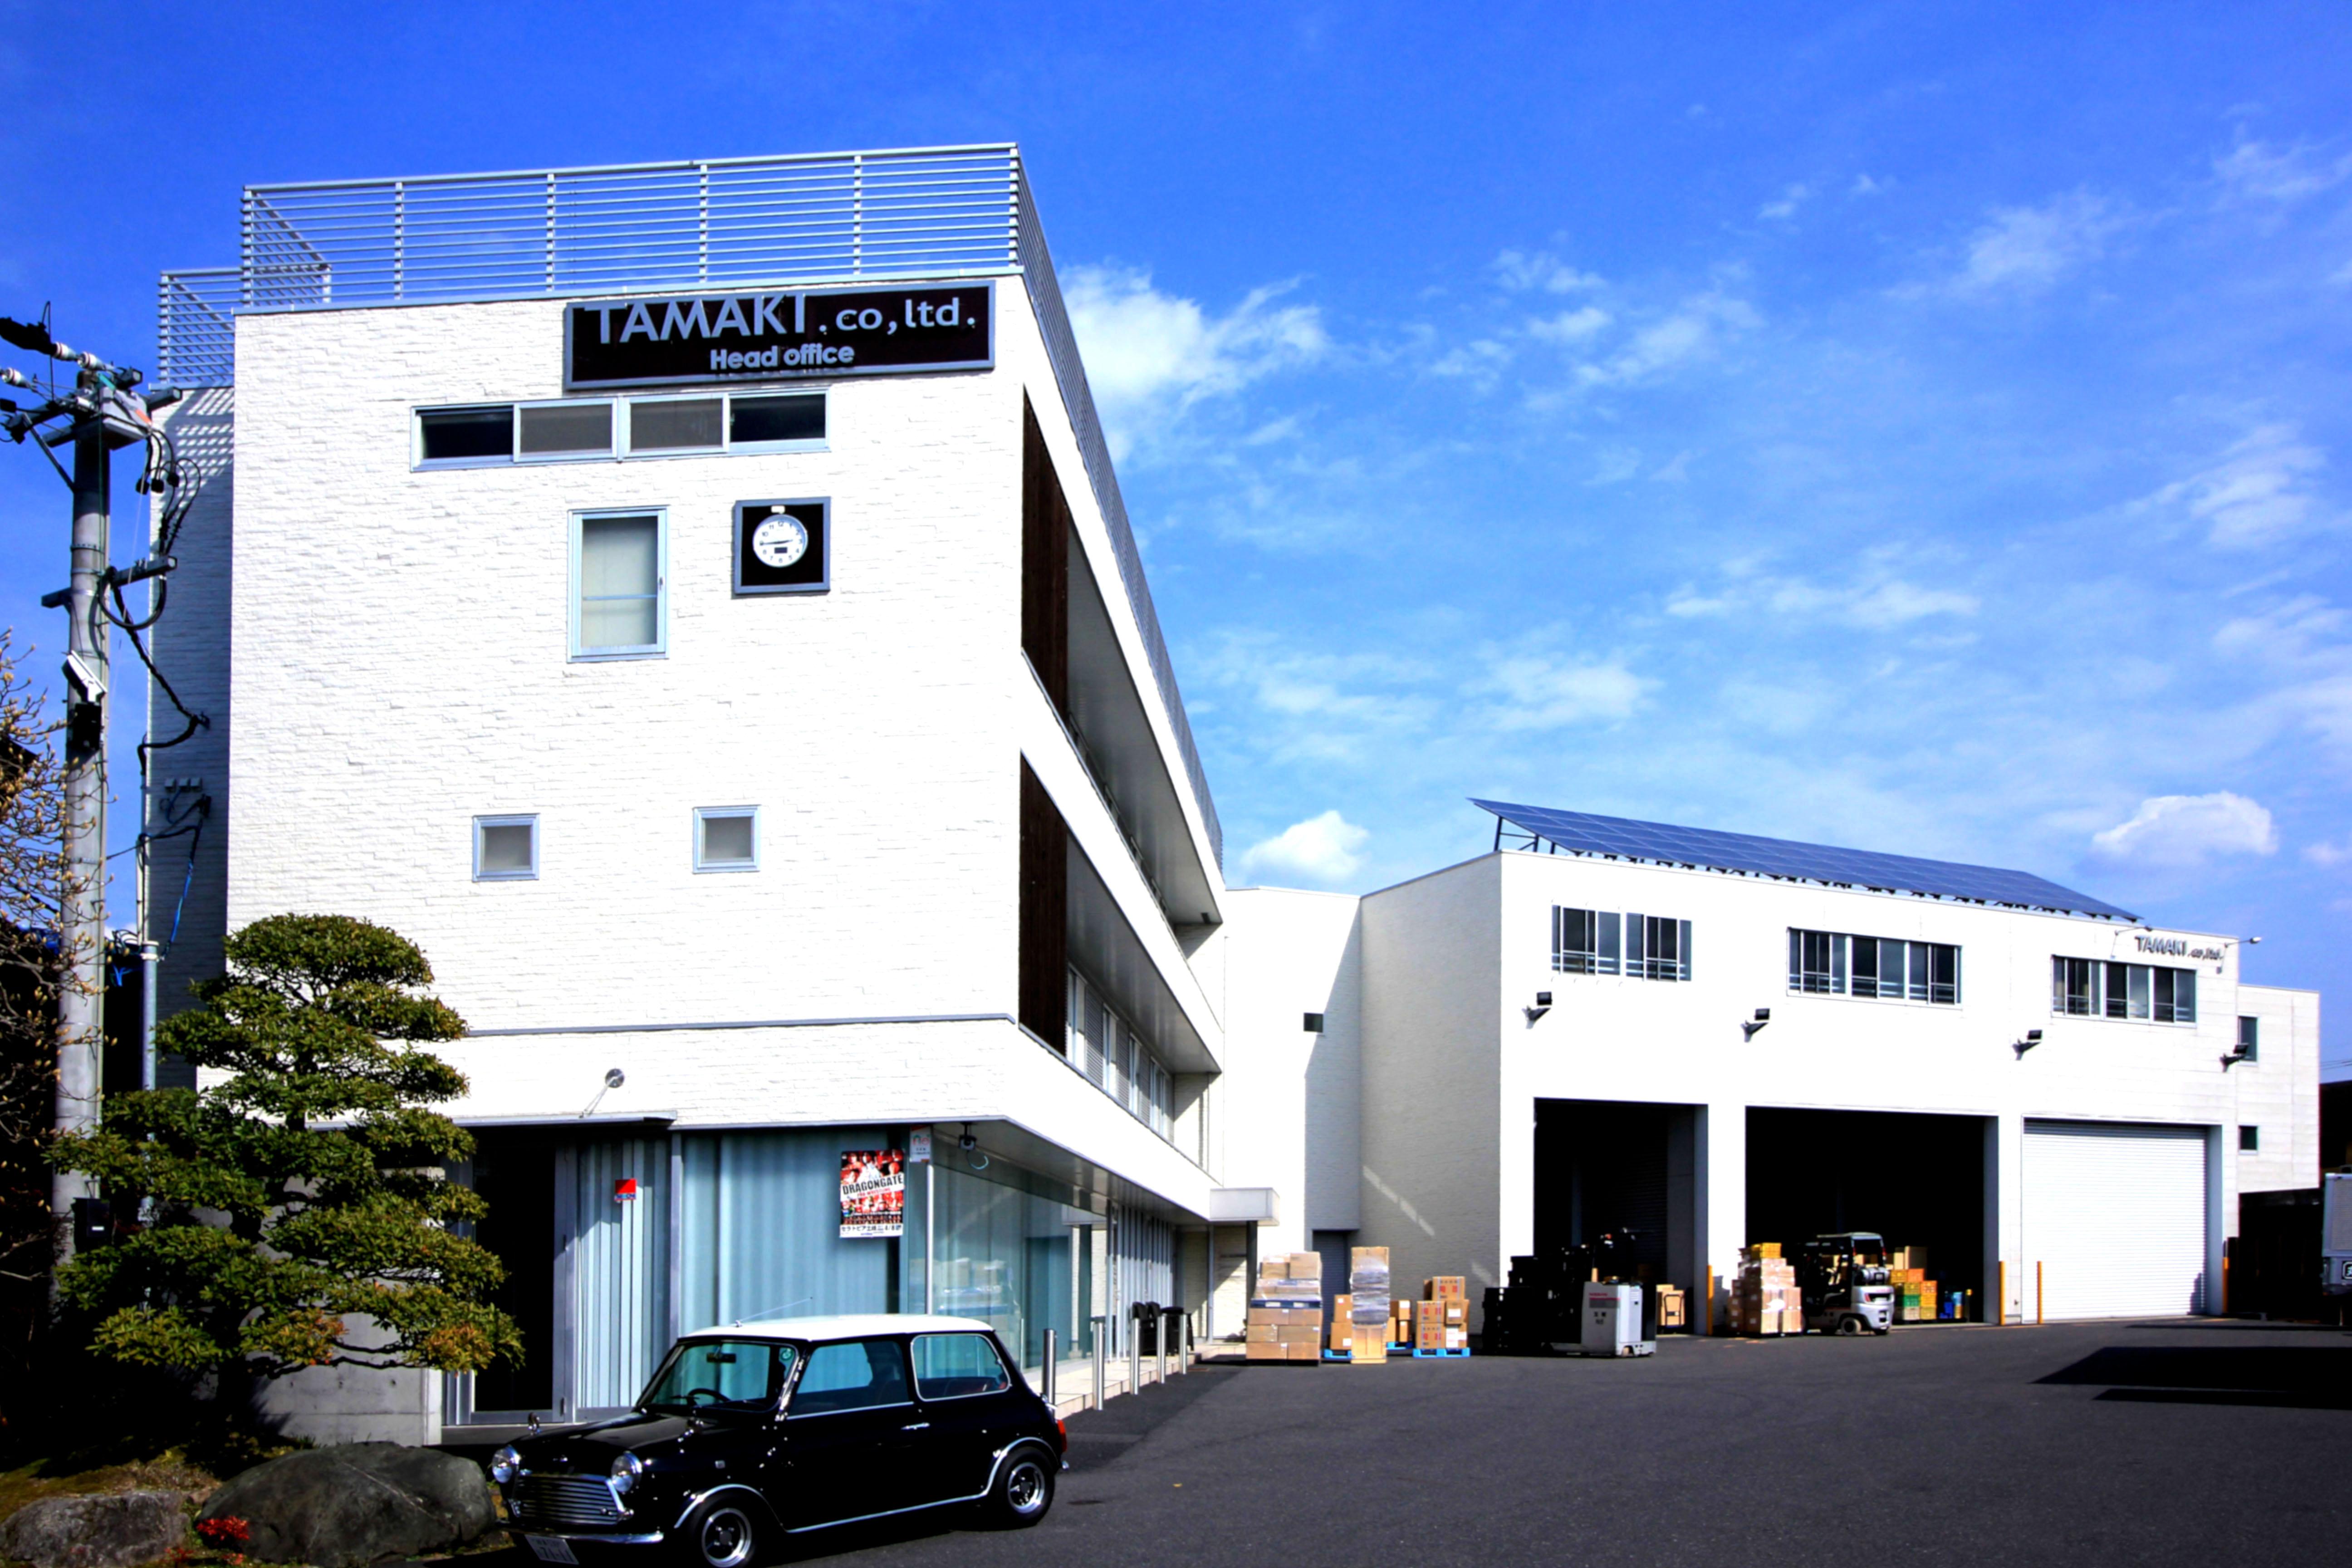 丸利玉樹利喜蔵商店(ショールーム/岐阜県土岐市)